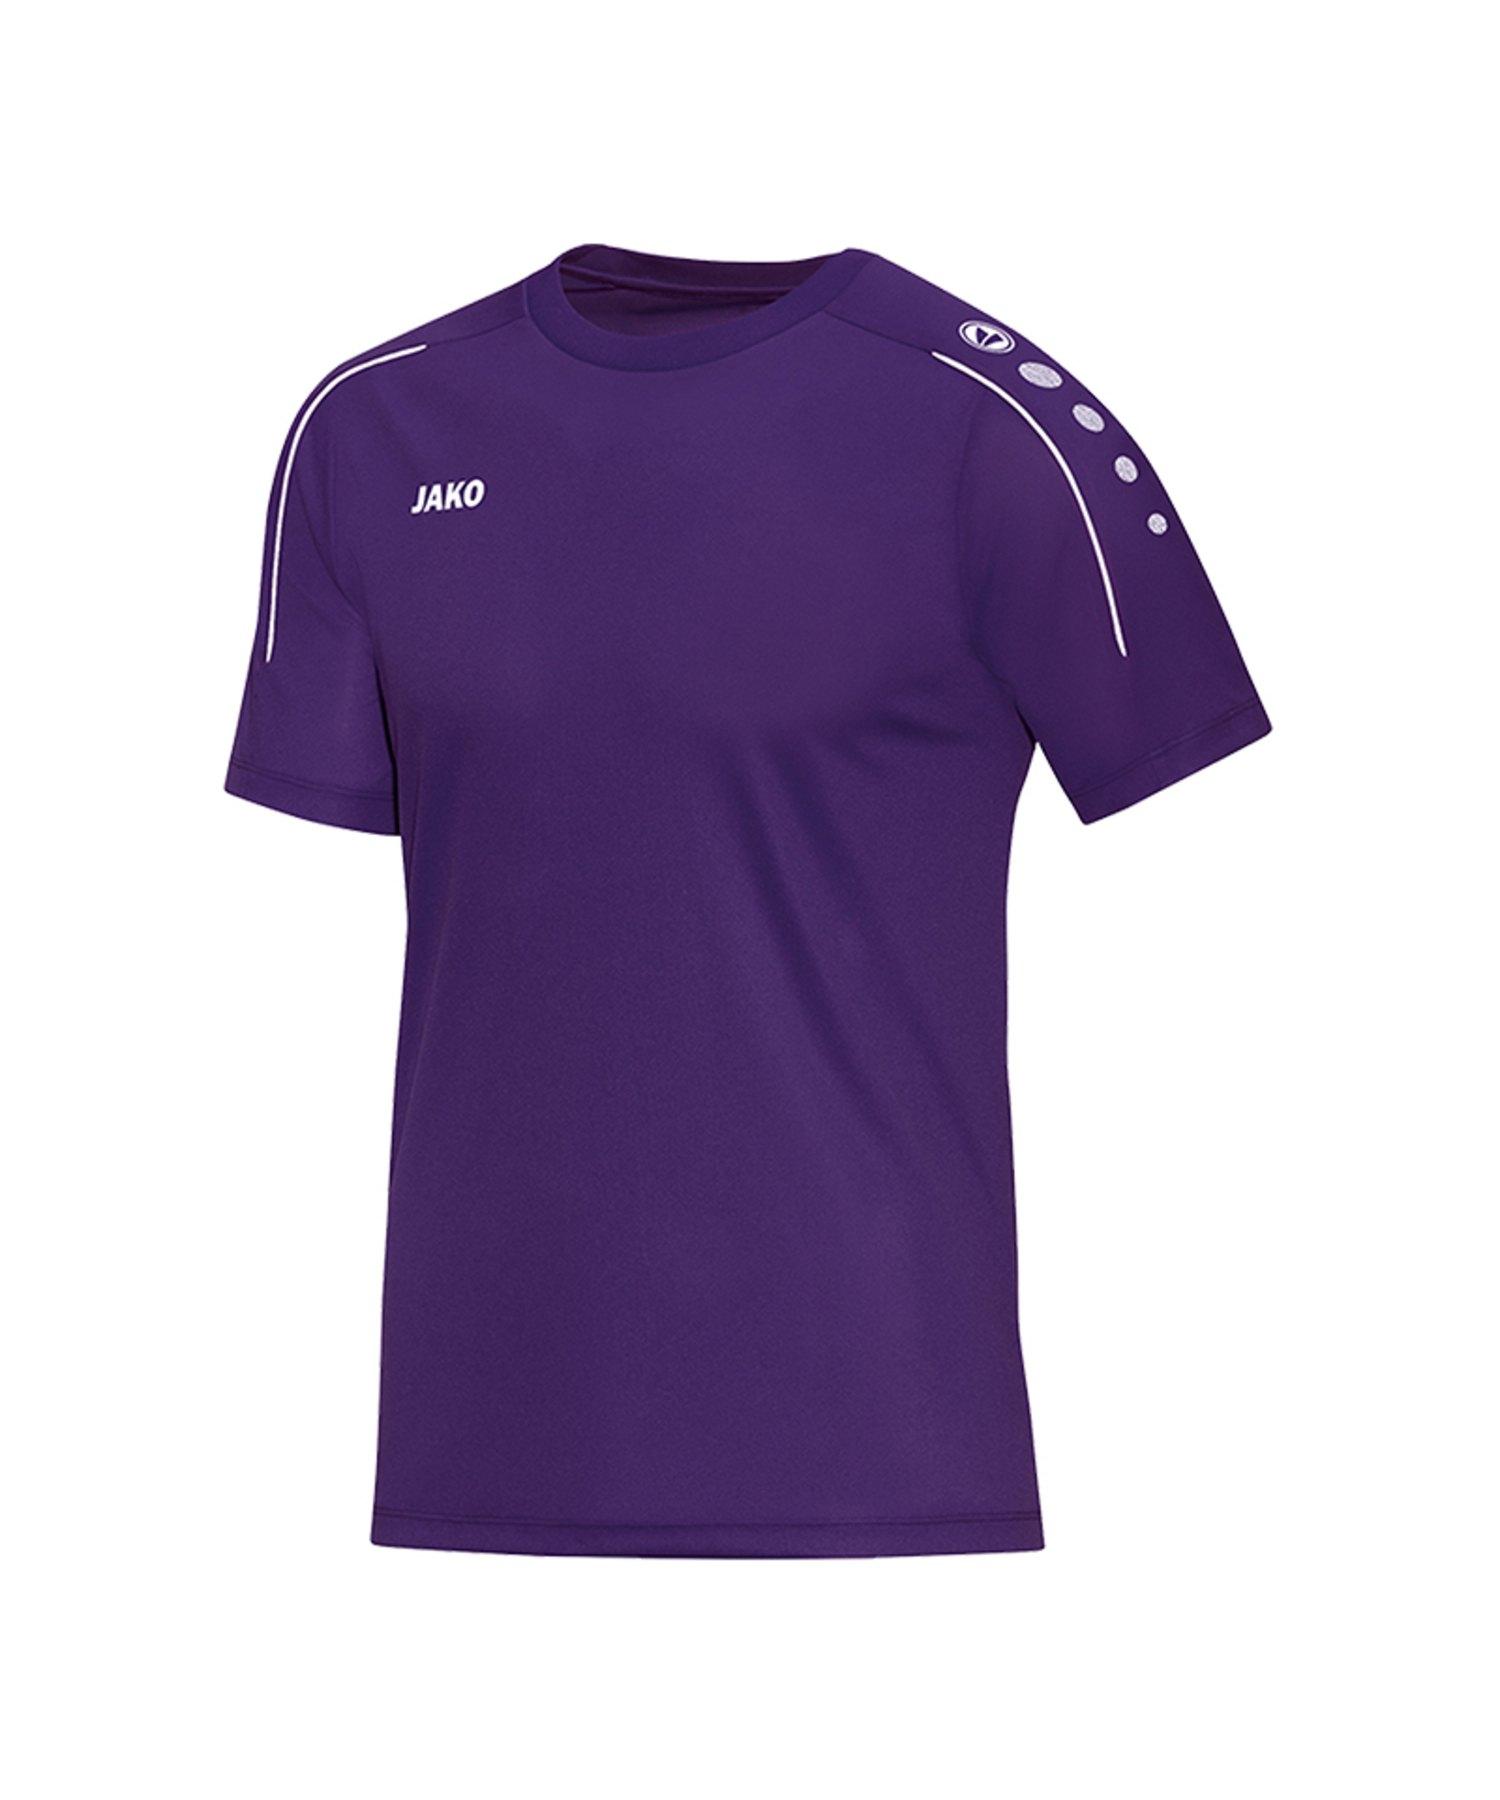 Jako Classico T-Shirt Lila F10 - Lila